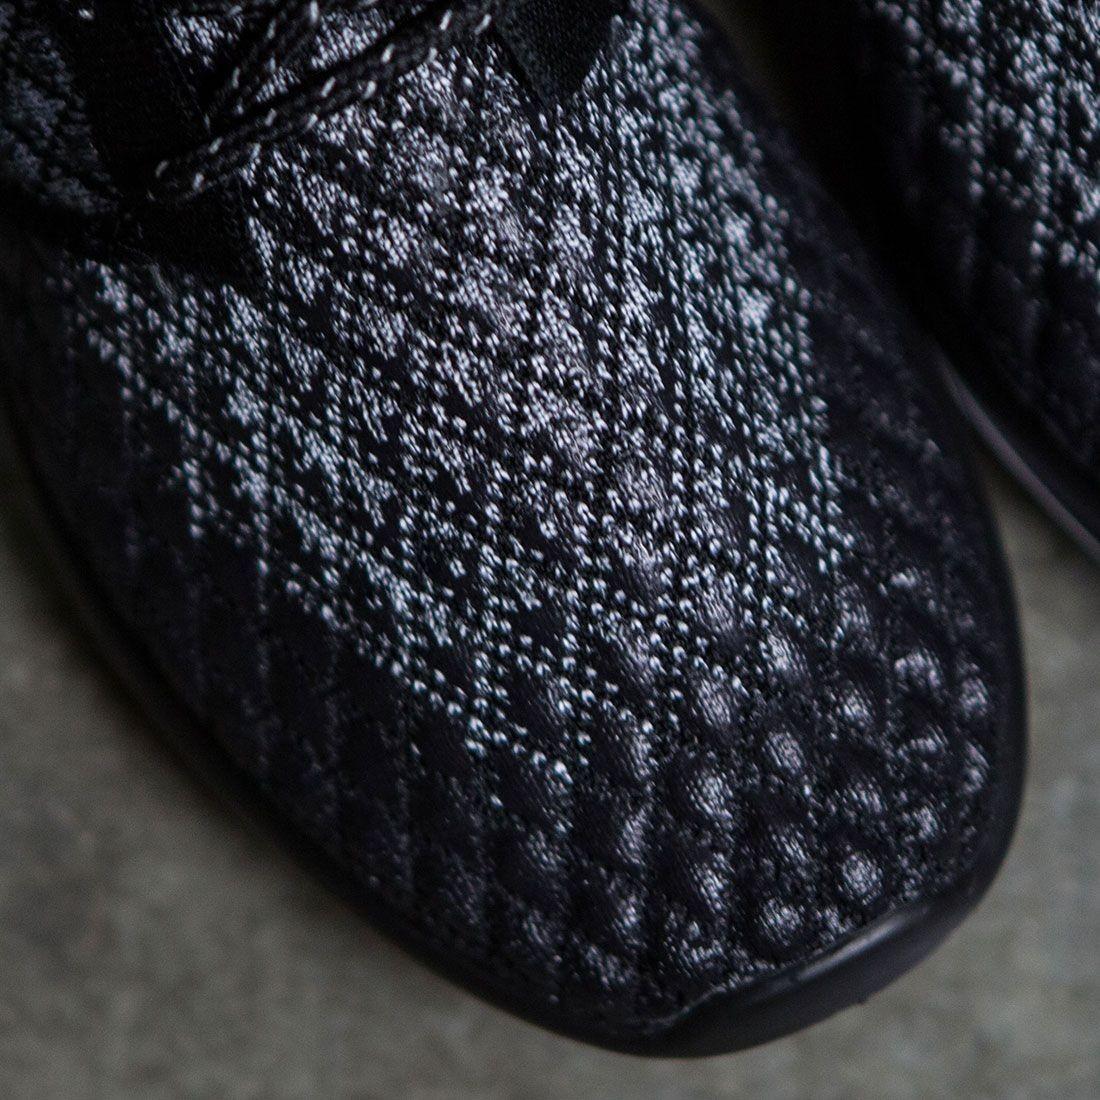 new style 69145 8c85b Nike Women W Roshe Two Flyknit 365 (wolf grey / wolf grey-black-white)